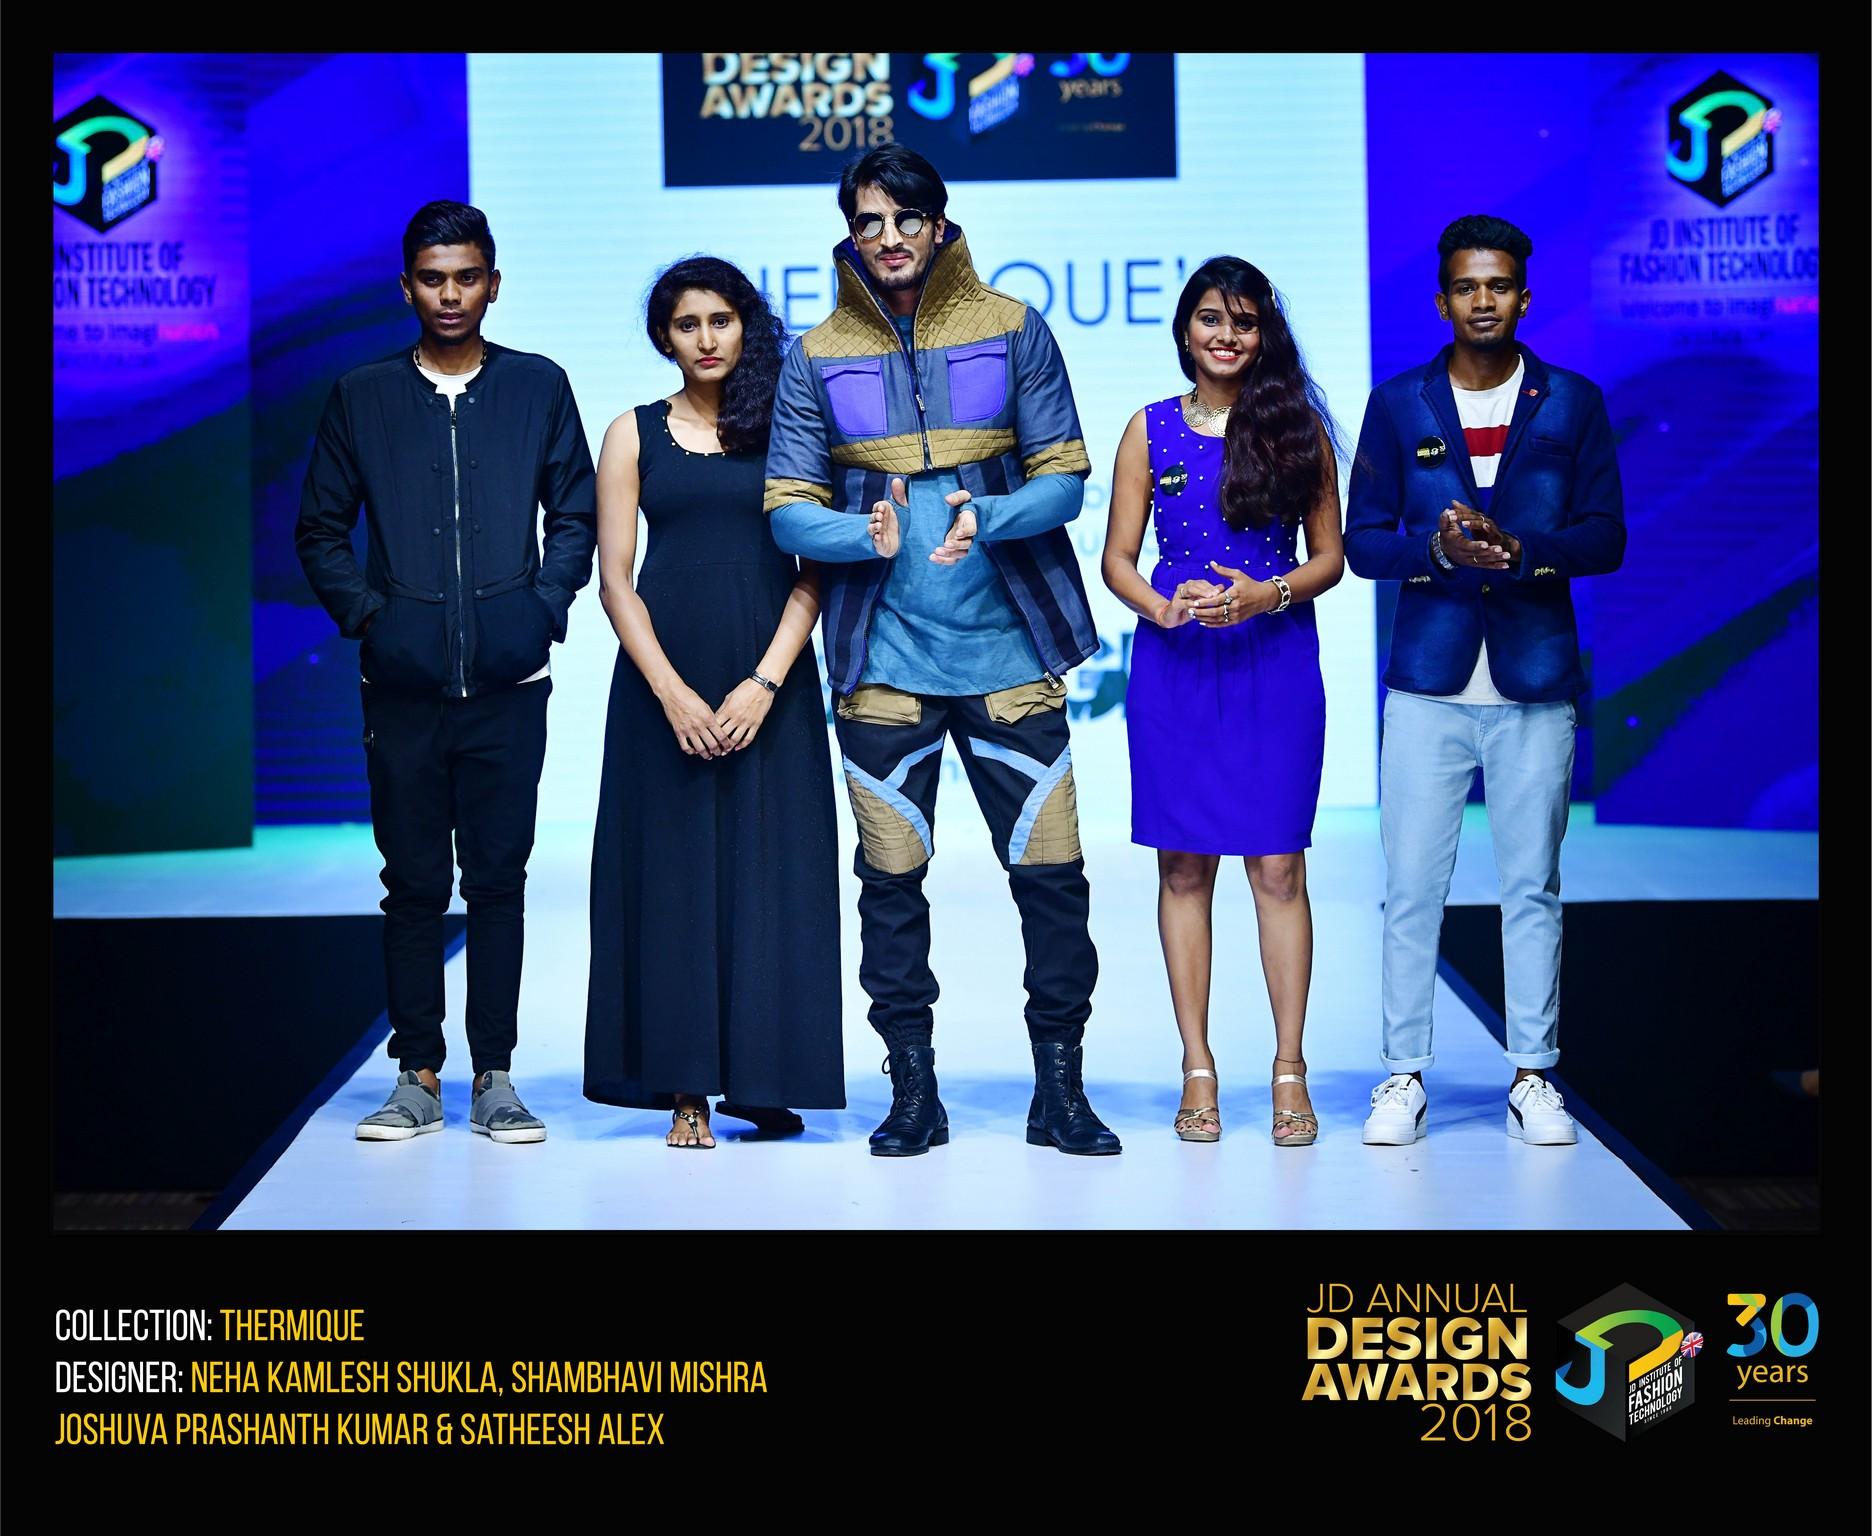 Thermique – Change – JD Annual Design Awards 2018 | Designer: Shambhavi, Neha and satish | Photography : Jerin Nath (@jerin_nath) thermique Thermique – Change – JD Annual Design Awards 2018 THERMIQUE 10